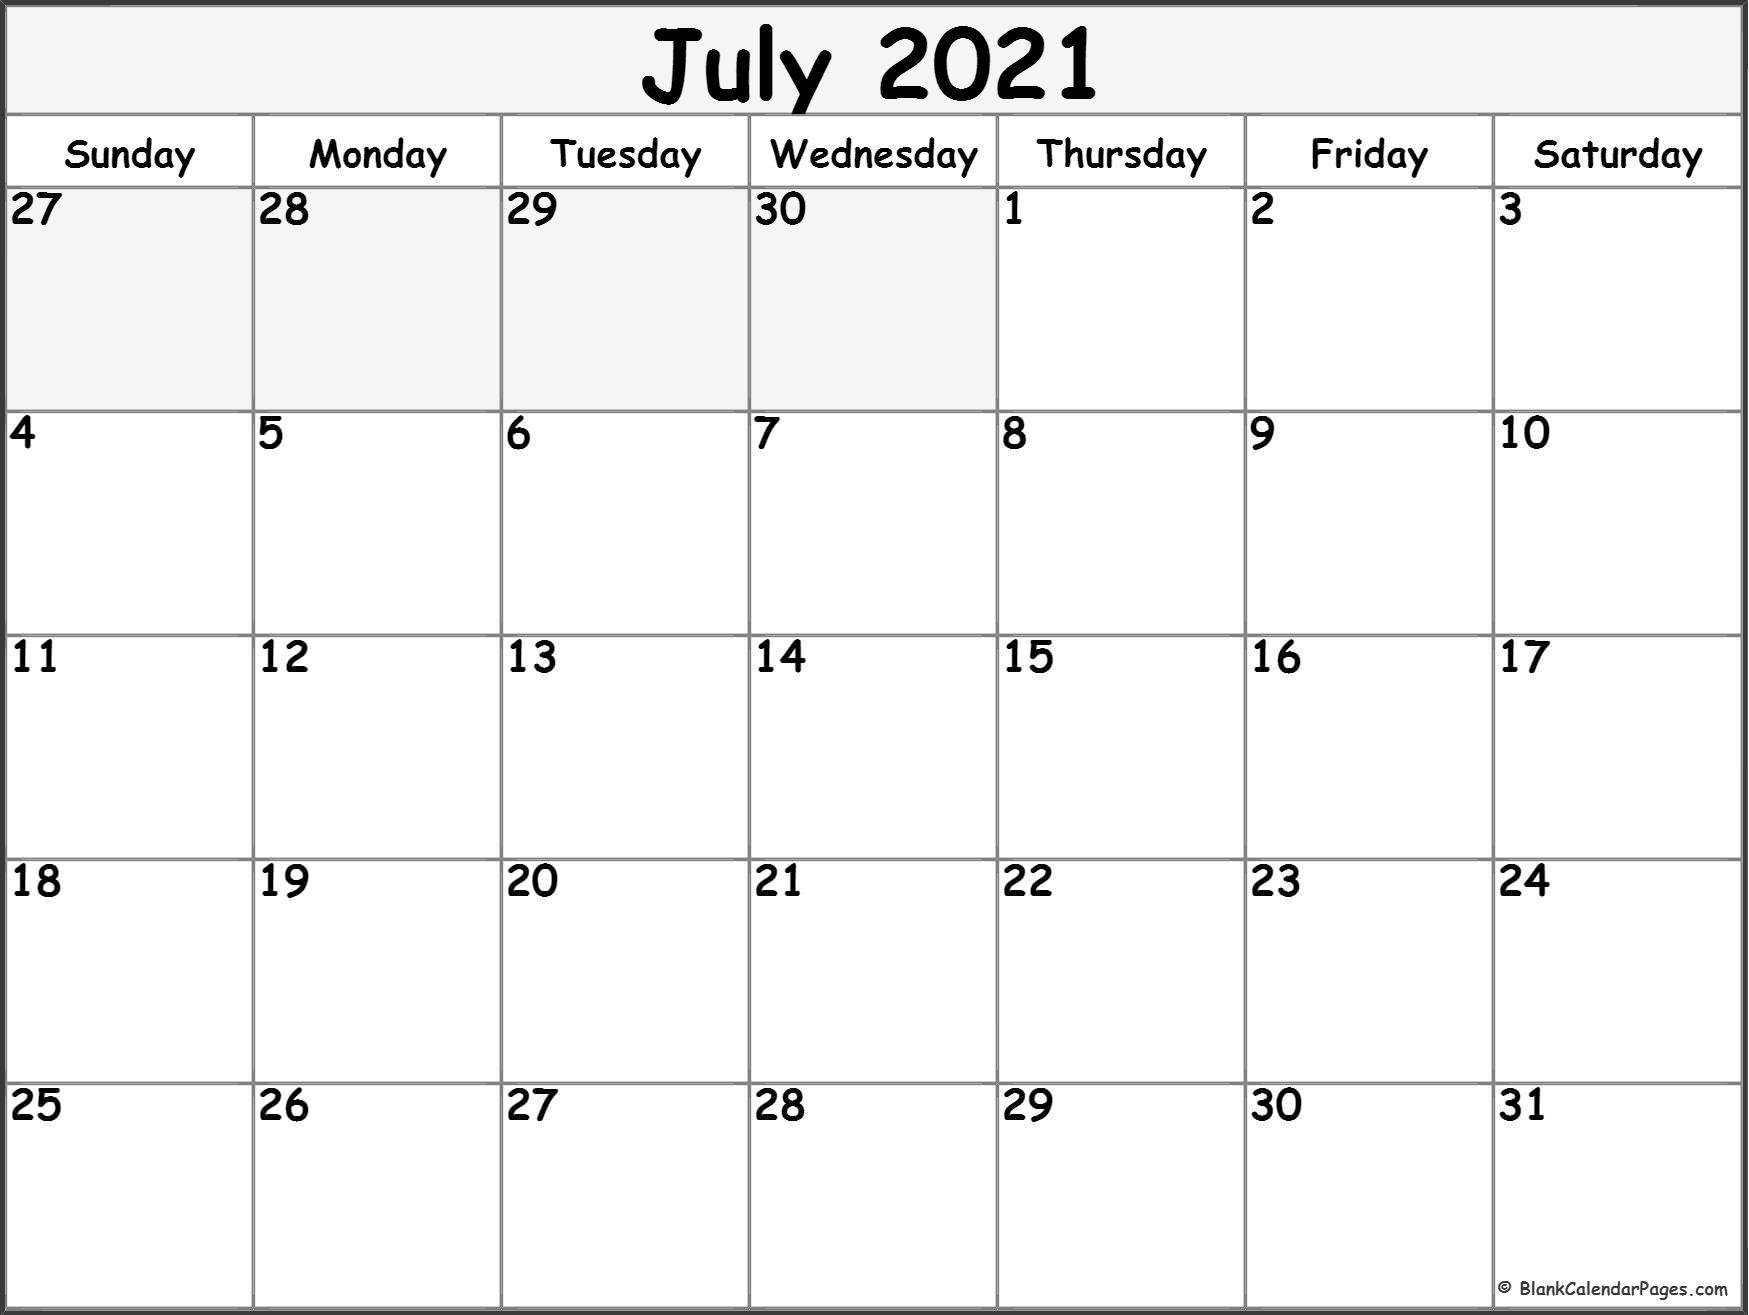 July 2021 Blank Calendar Templates. July 2021 Calendar Portrait